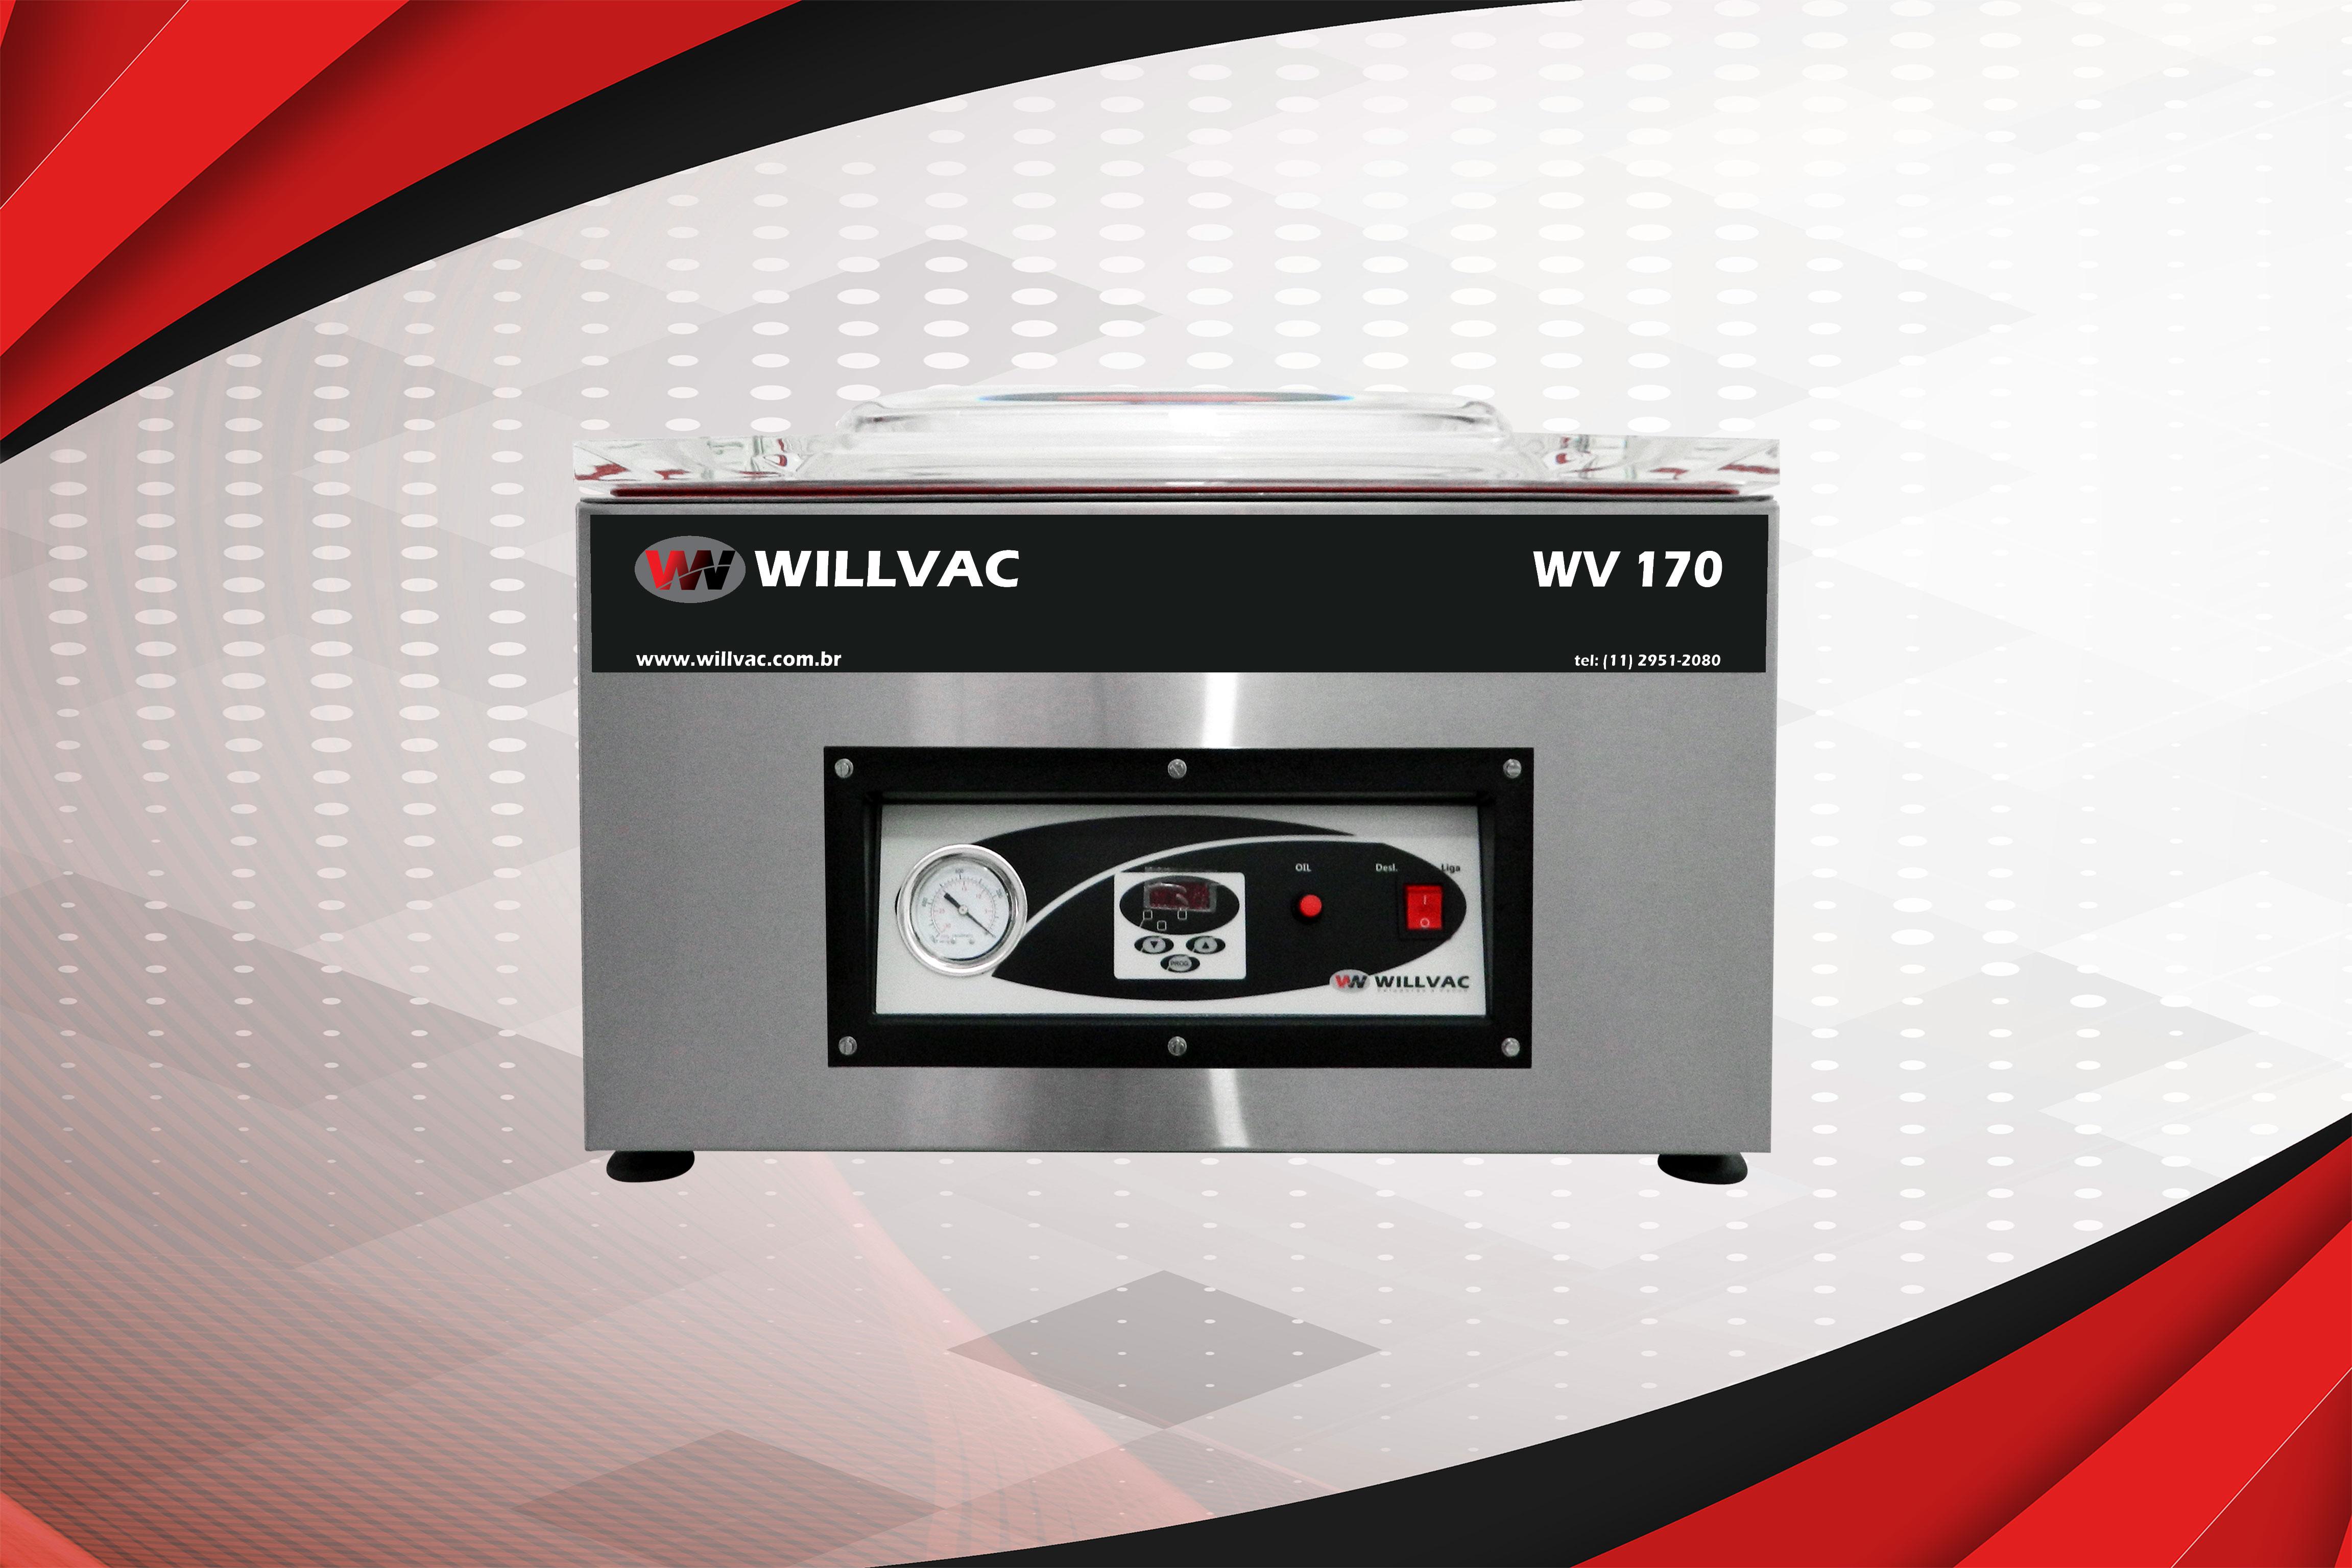 WV 170